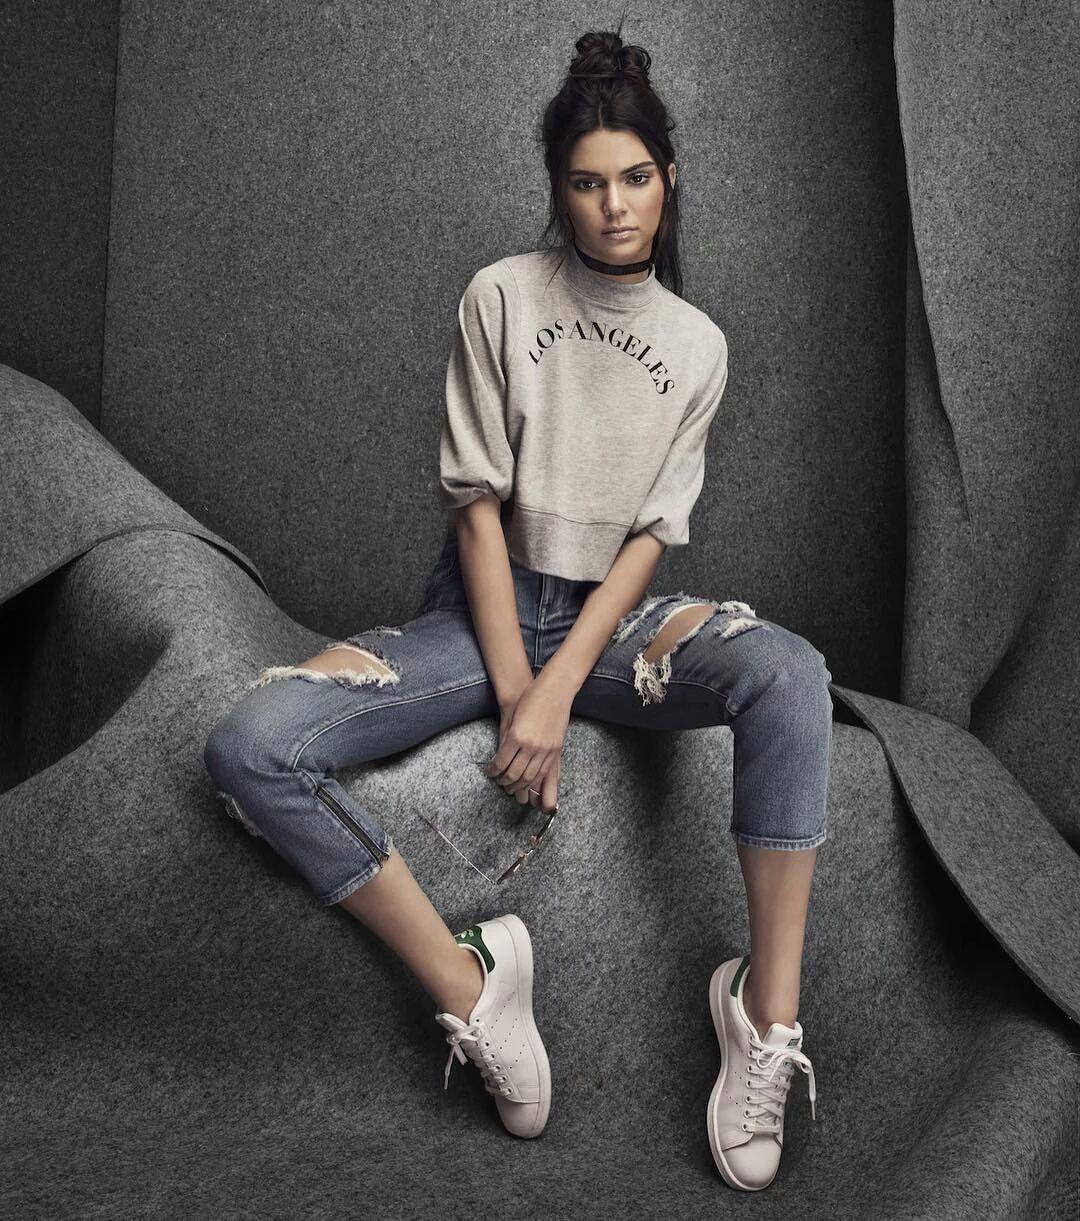 online store 59eda cb756 Pinterest  wildwavezzz Hipster Grunge, Kendall Jenner Clothes, Kendall  Jenner Modeling, Kendall Jenner